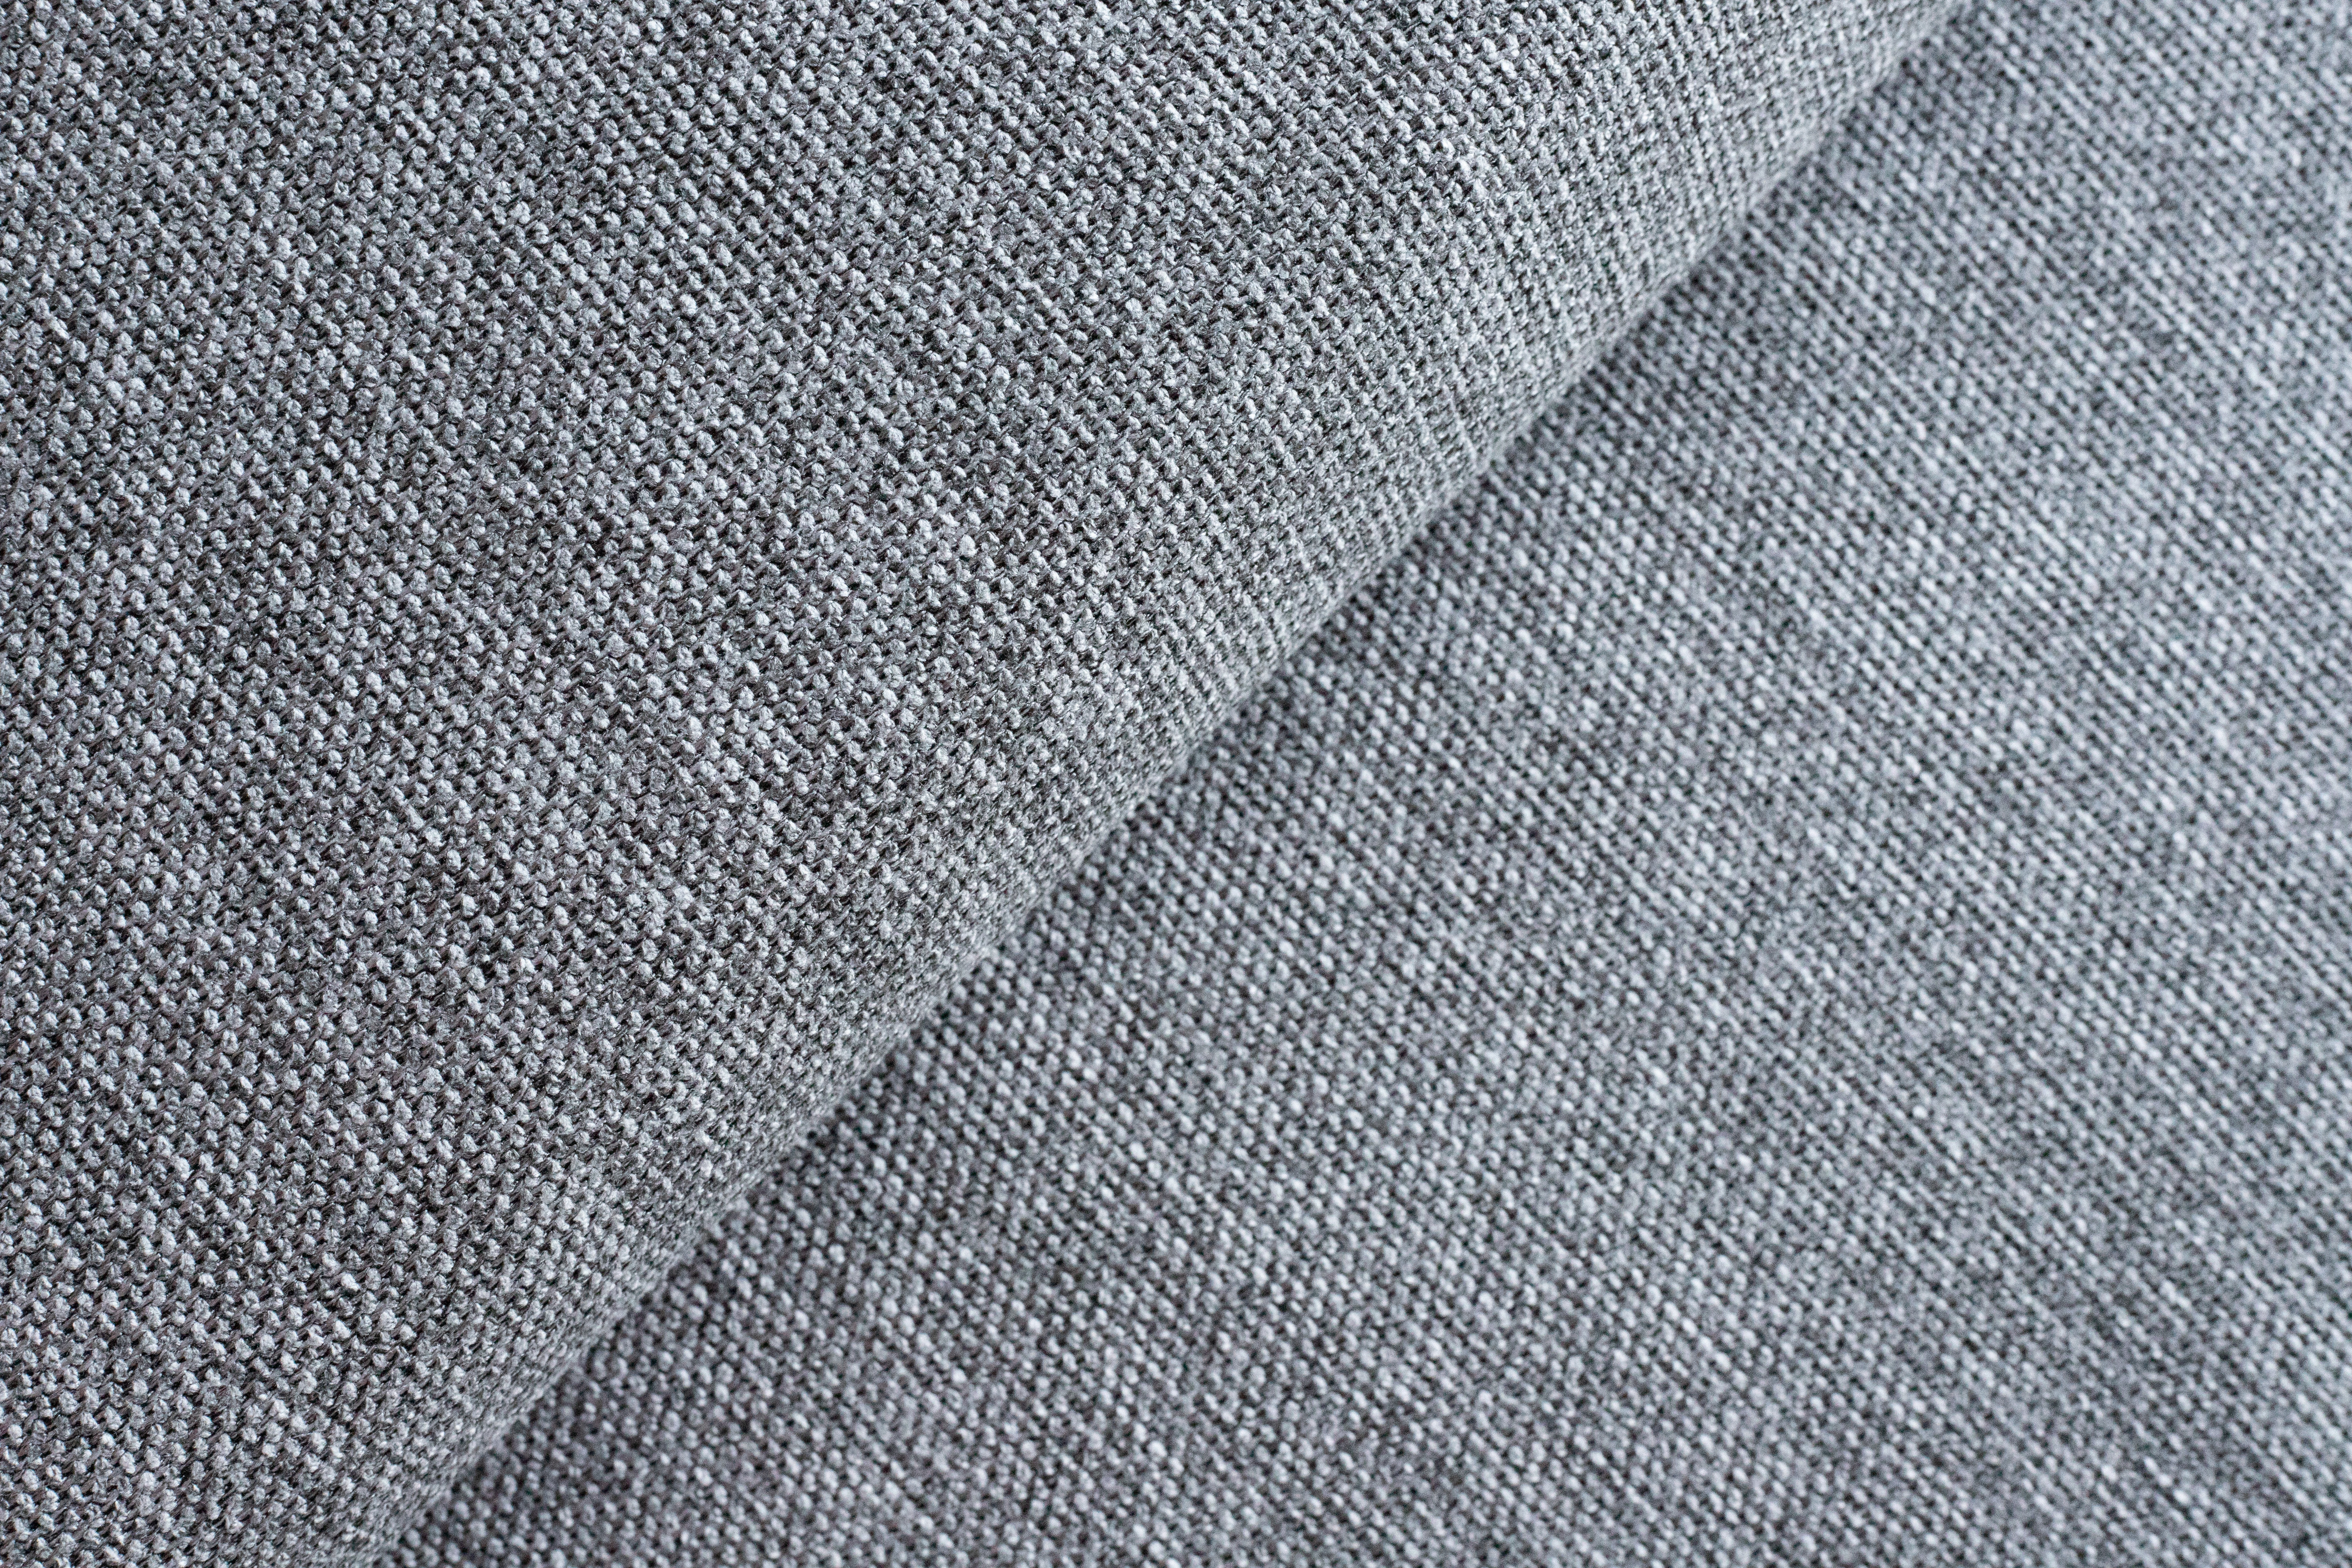 Potocki tkaniny: urban 5 300dpi